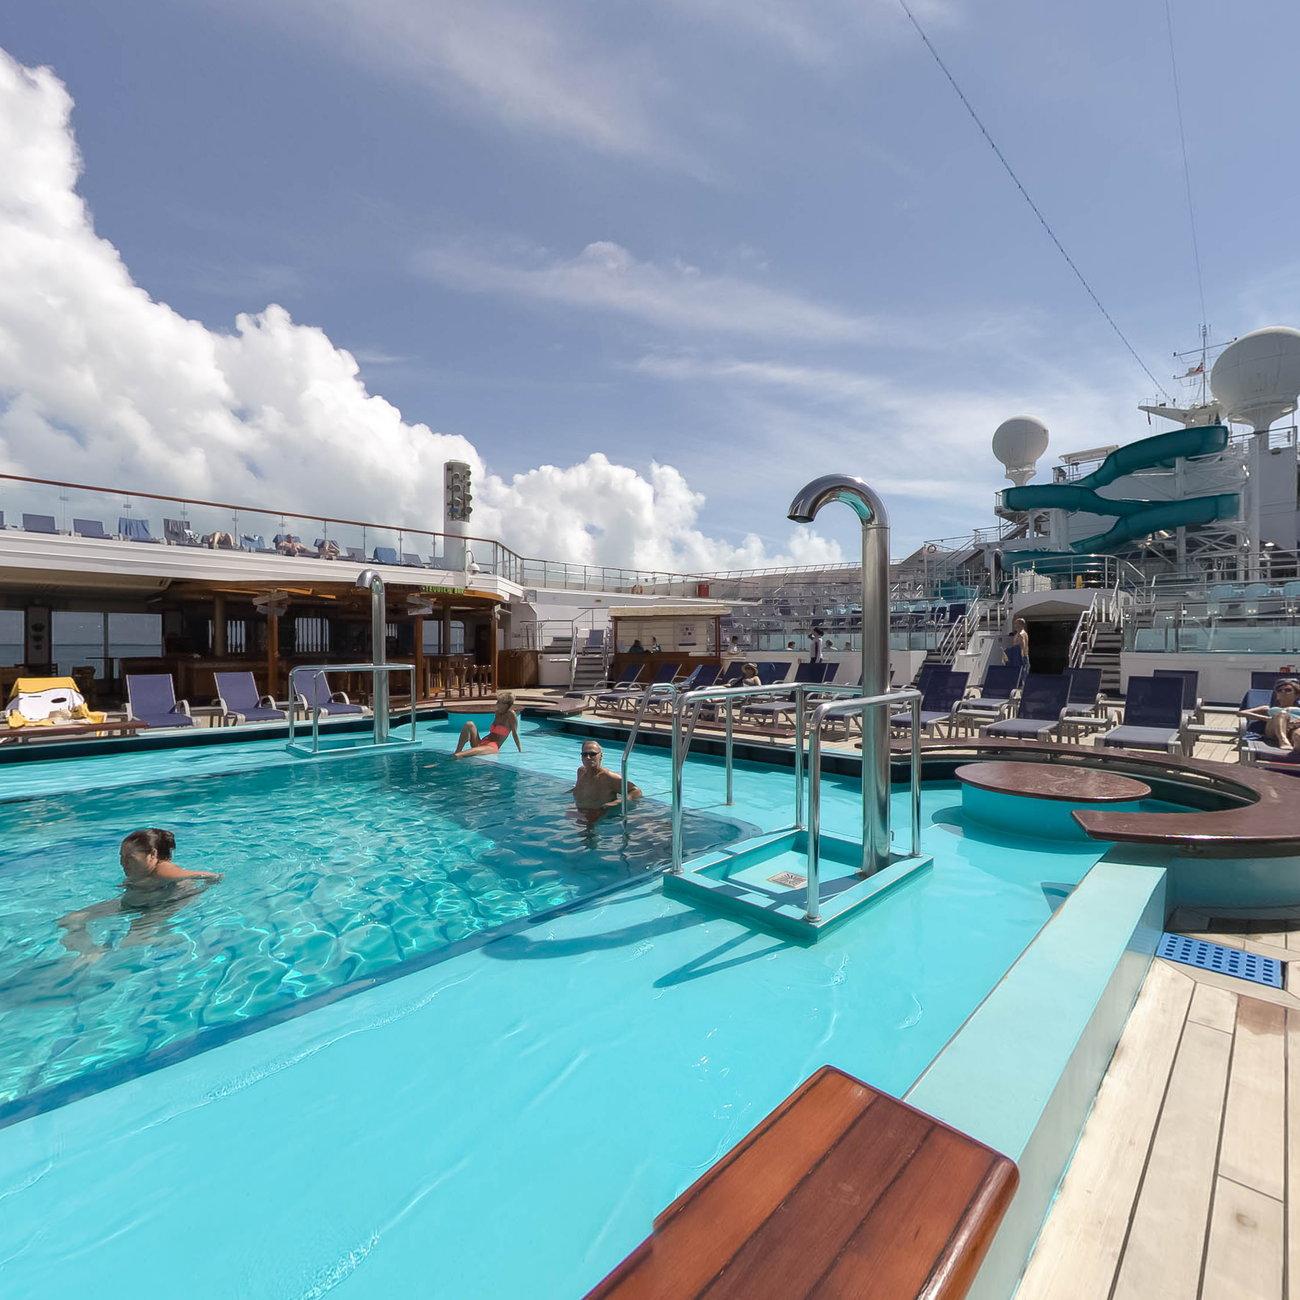 Pool on Carnival Glory Cruise Ship - Cruise Critic